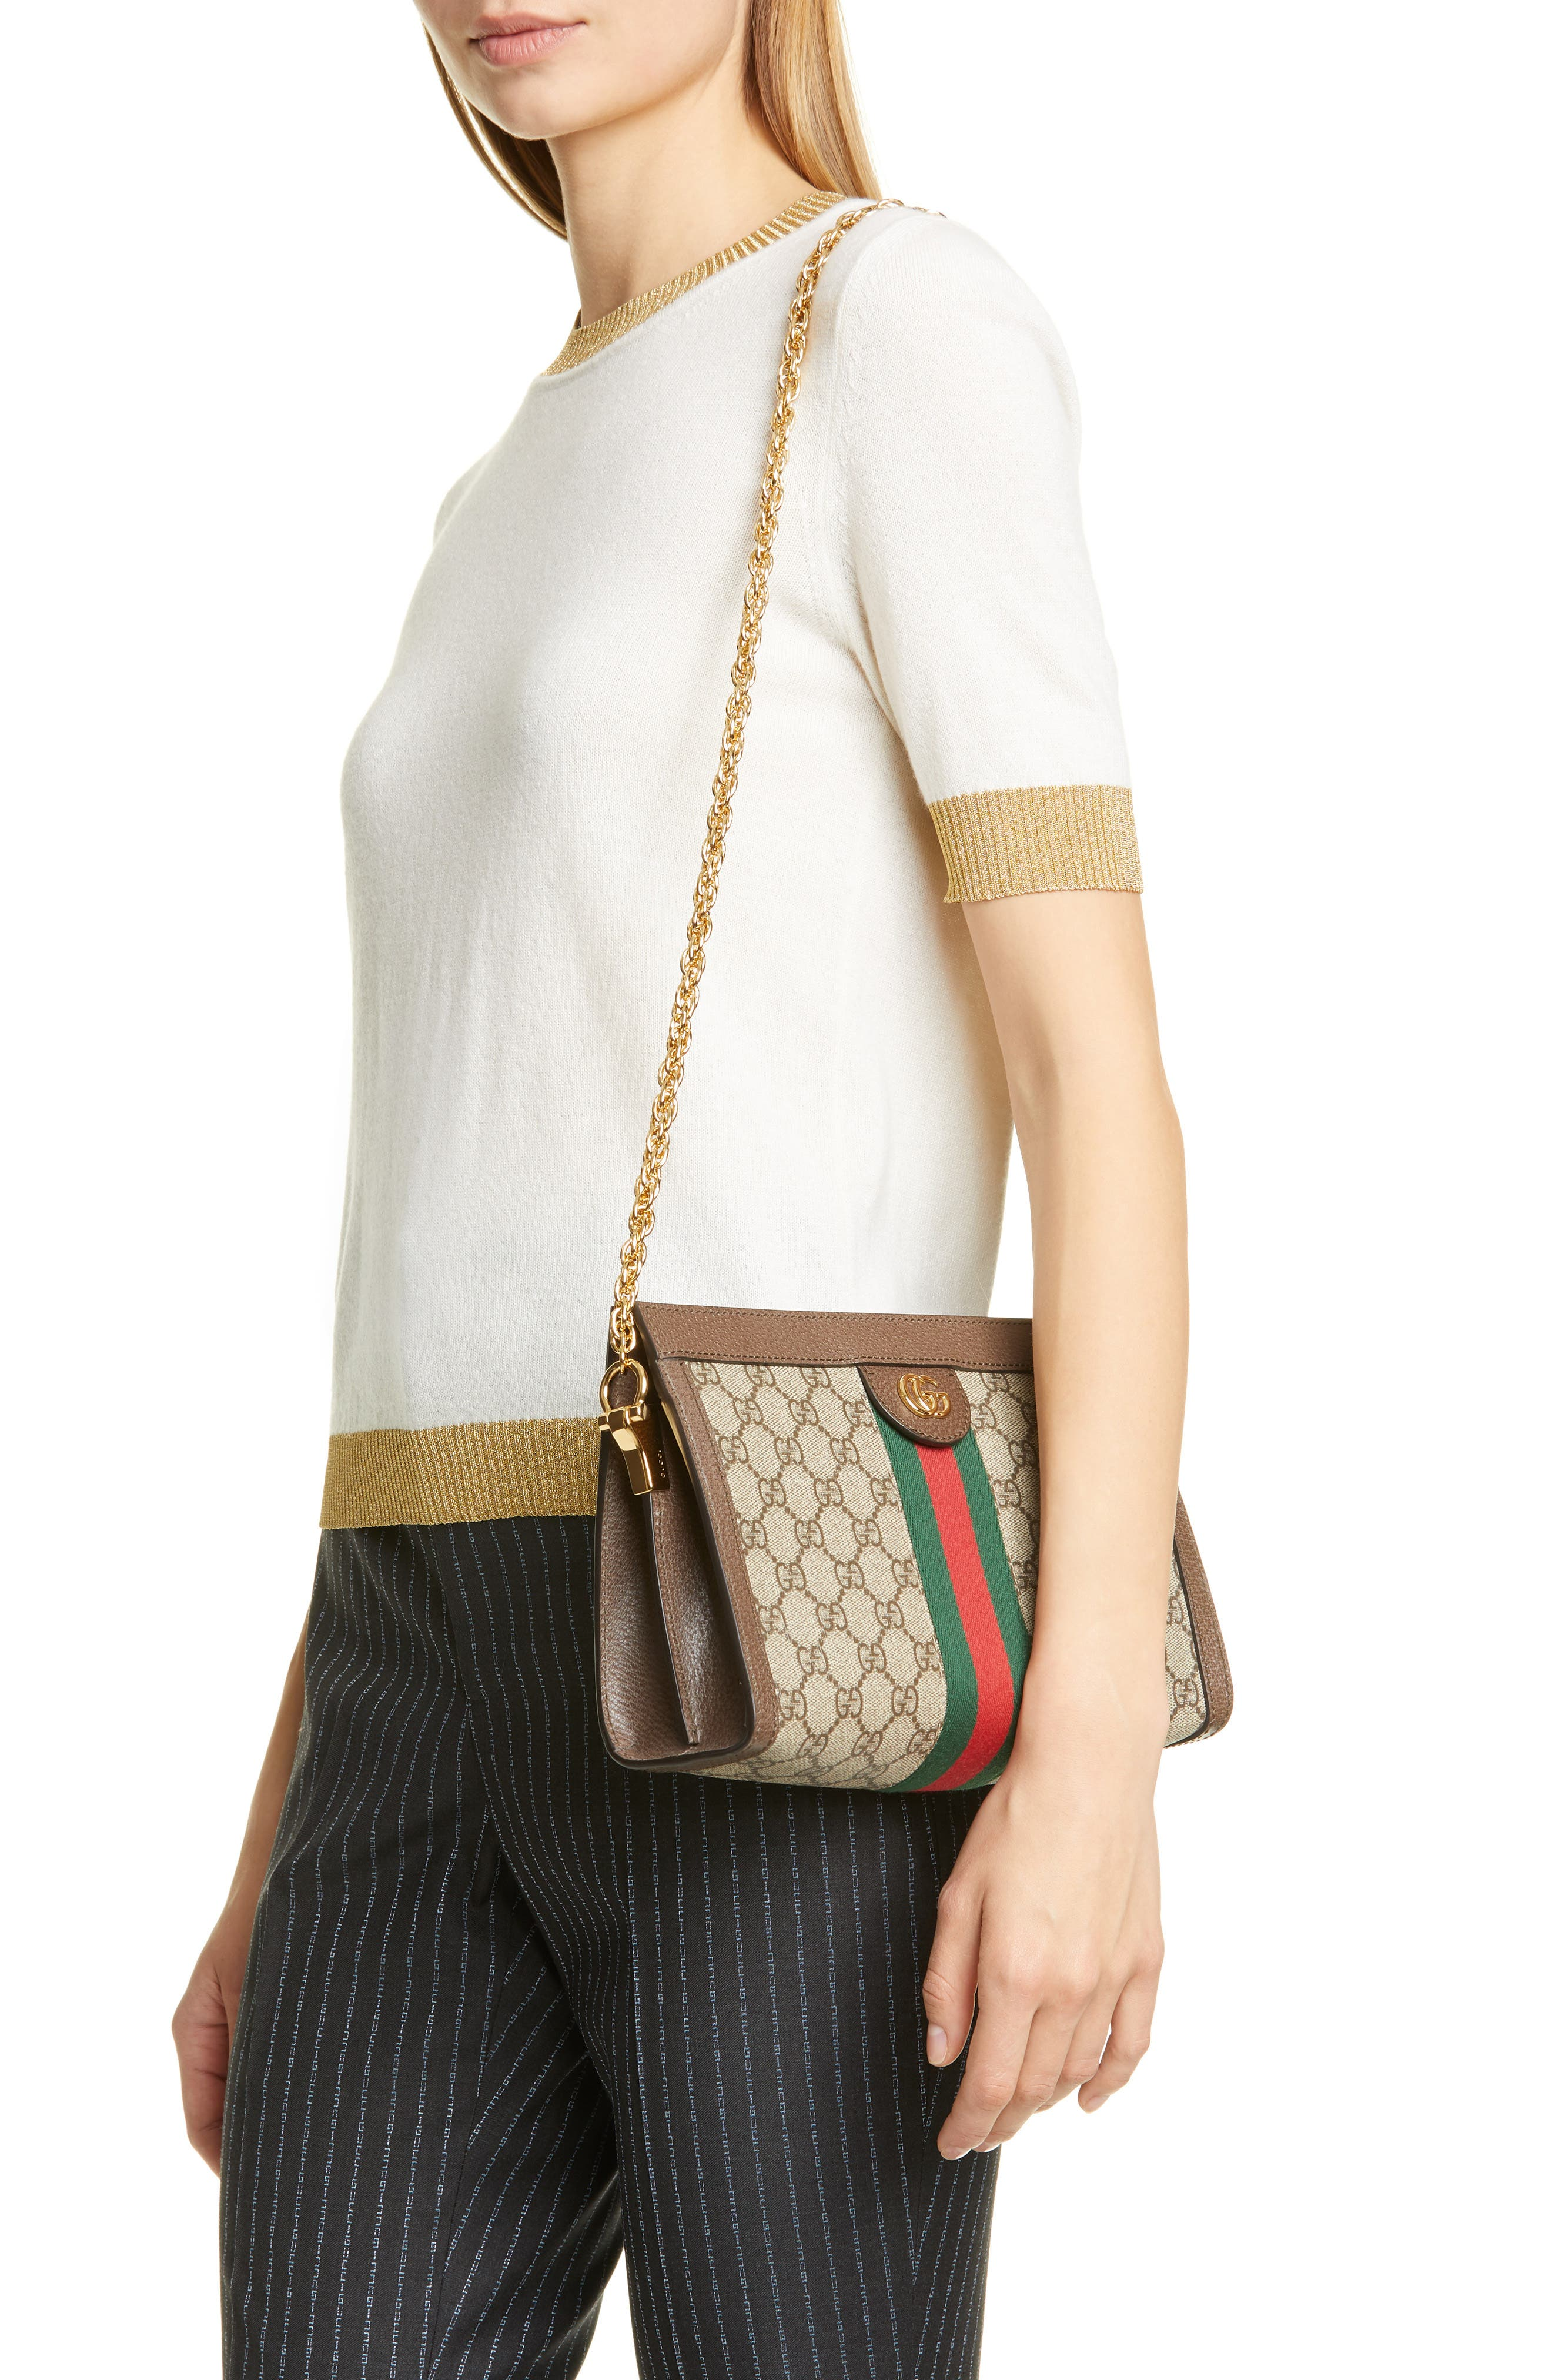 GUCCI, Small GG Supreme Shoulder Bag, Alternate thumbnail 2, color, BEIGE EBONY/ NERO/ VERT/ RED